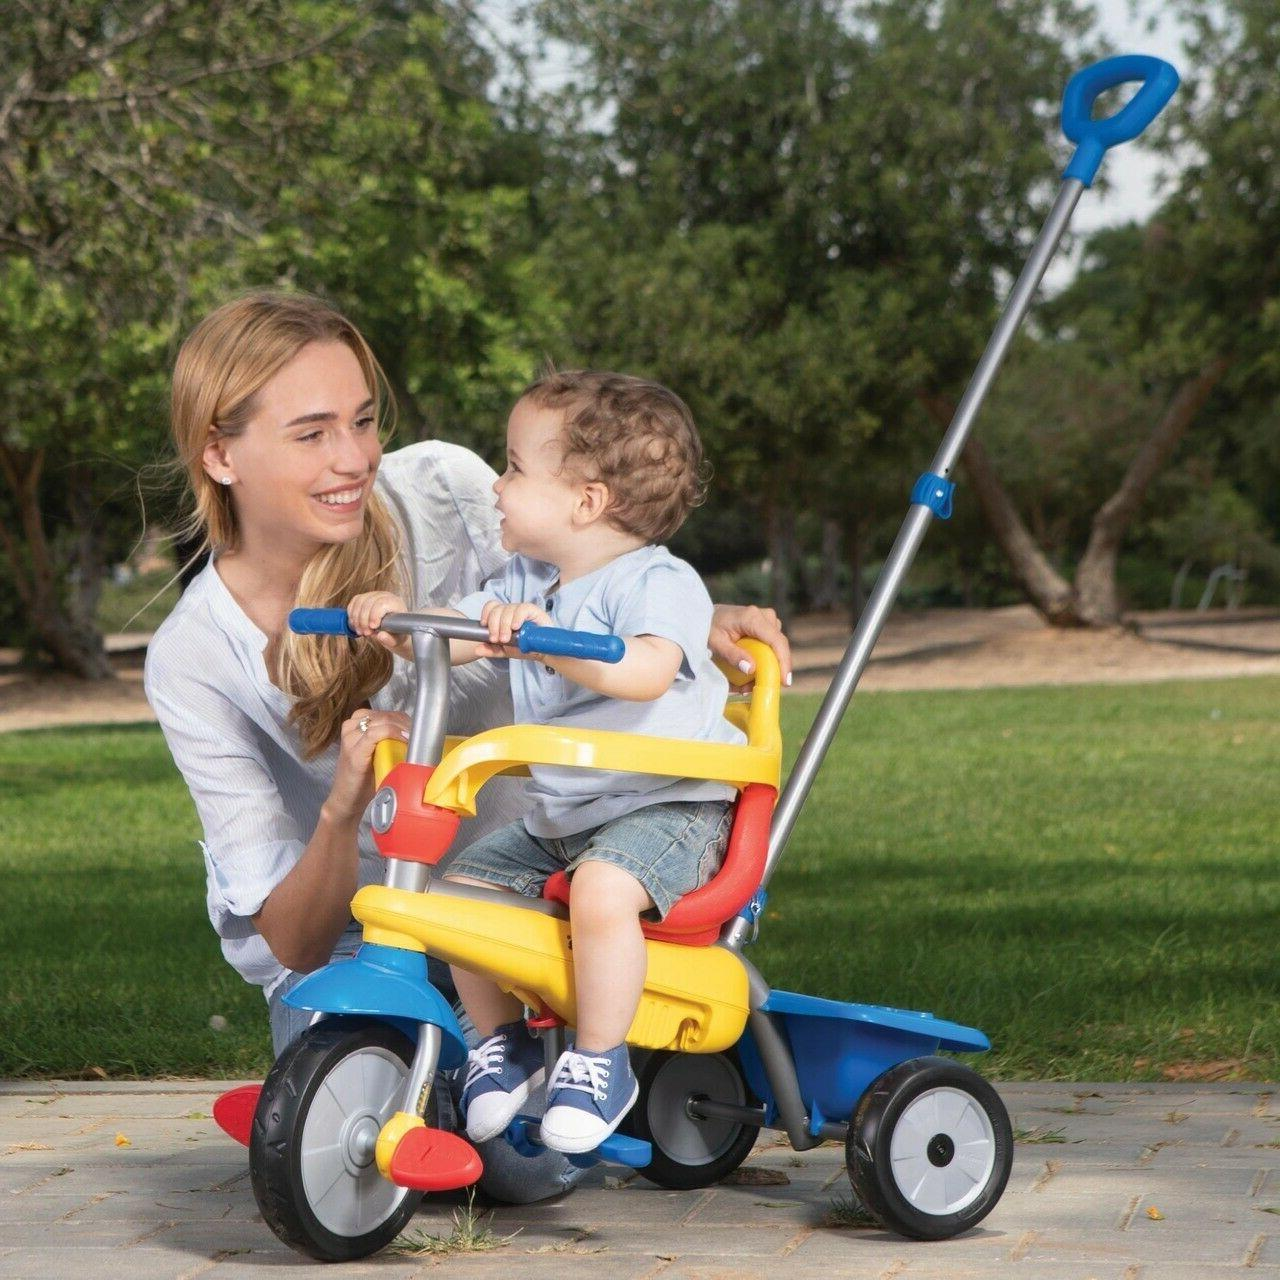 smarTrike Breeze 3 1 Smart for kid toddler